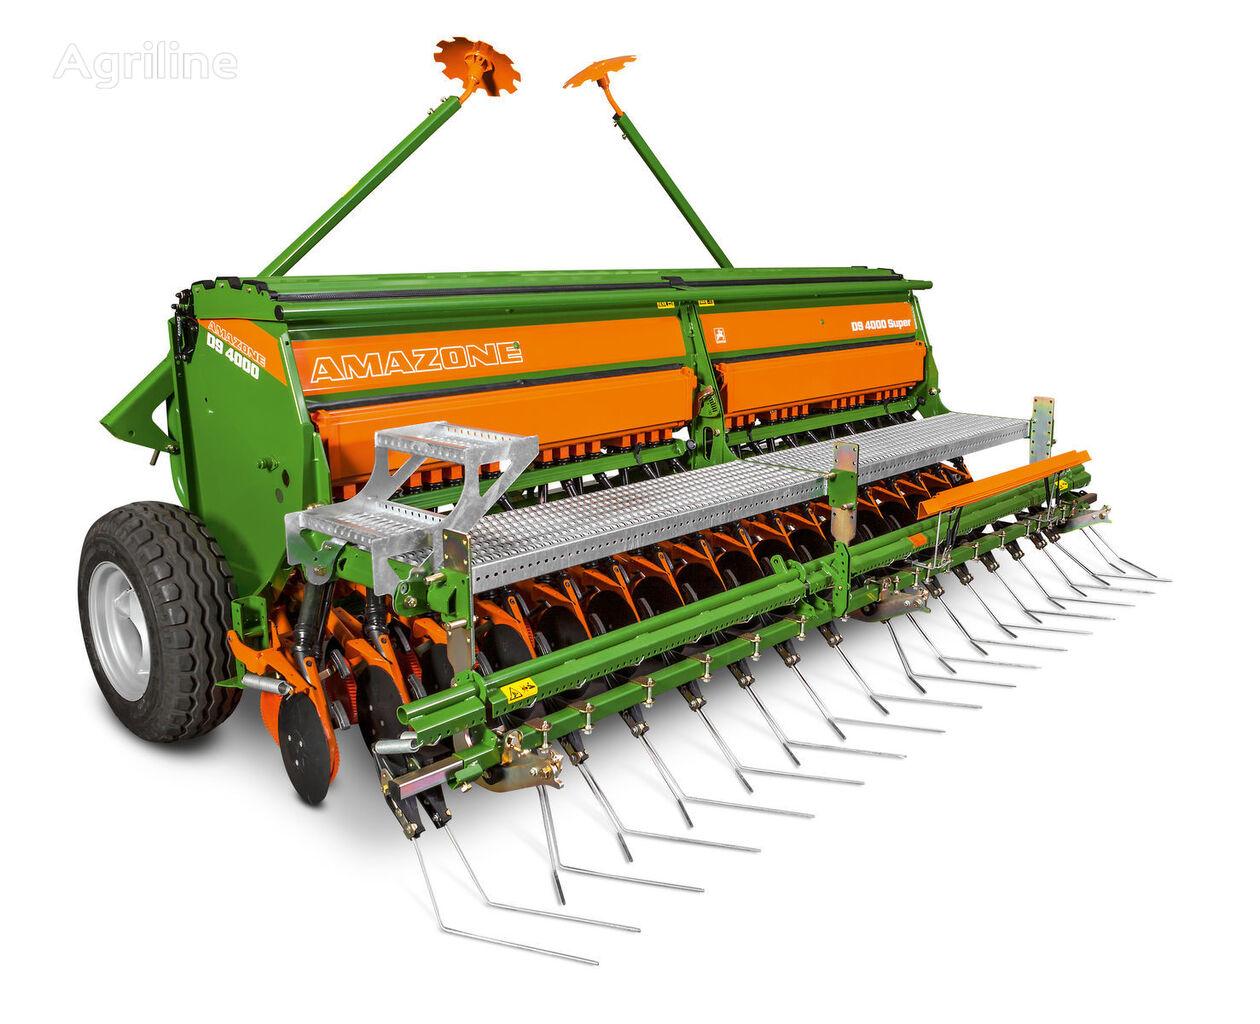 new AMAZONE D9 4000, V NALIChII, TORG ! mechanical seed drill